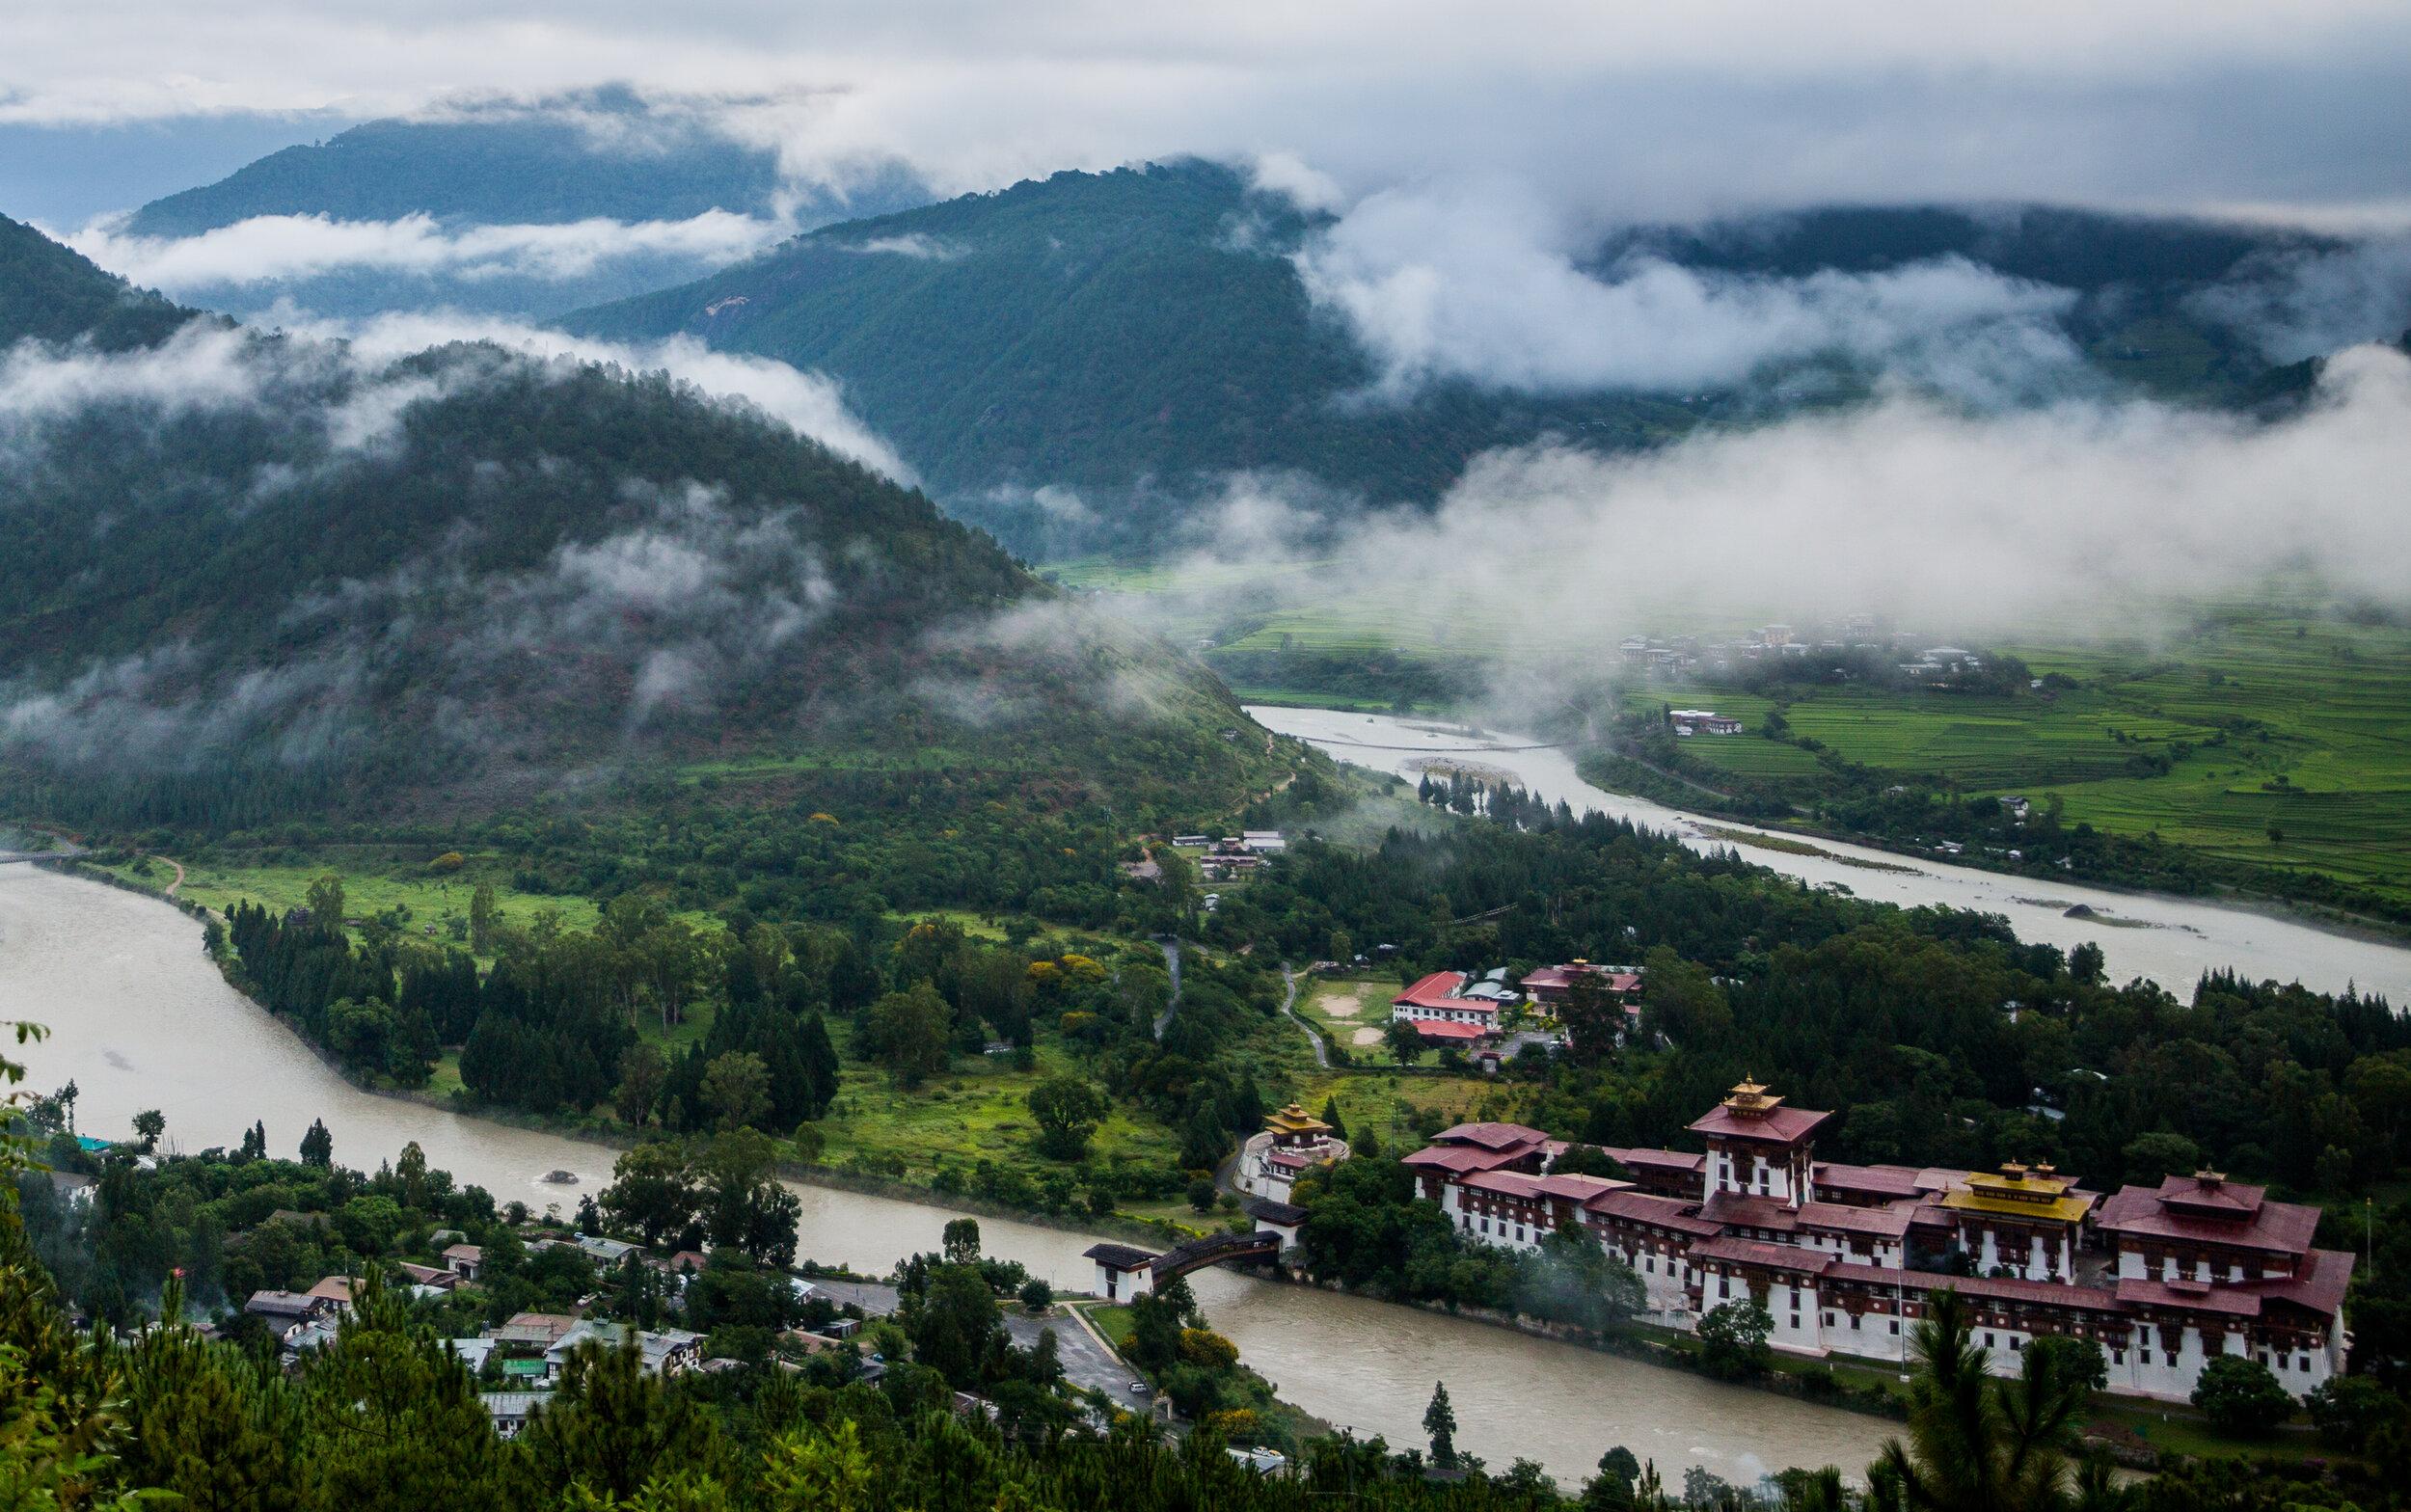 The view of Punakha Dzong from Dhumra Farm Resort.